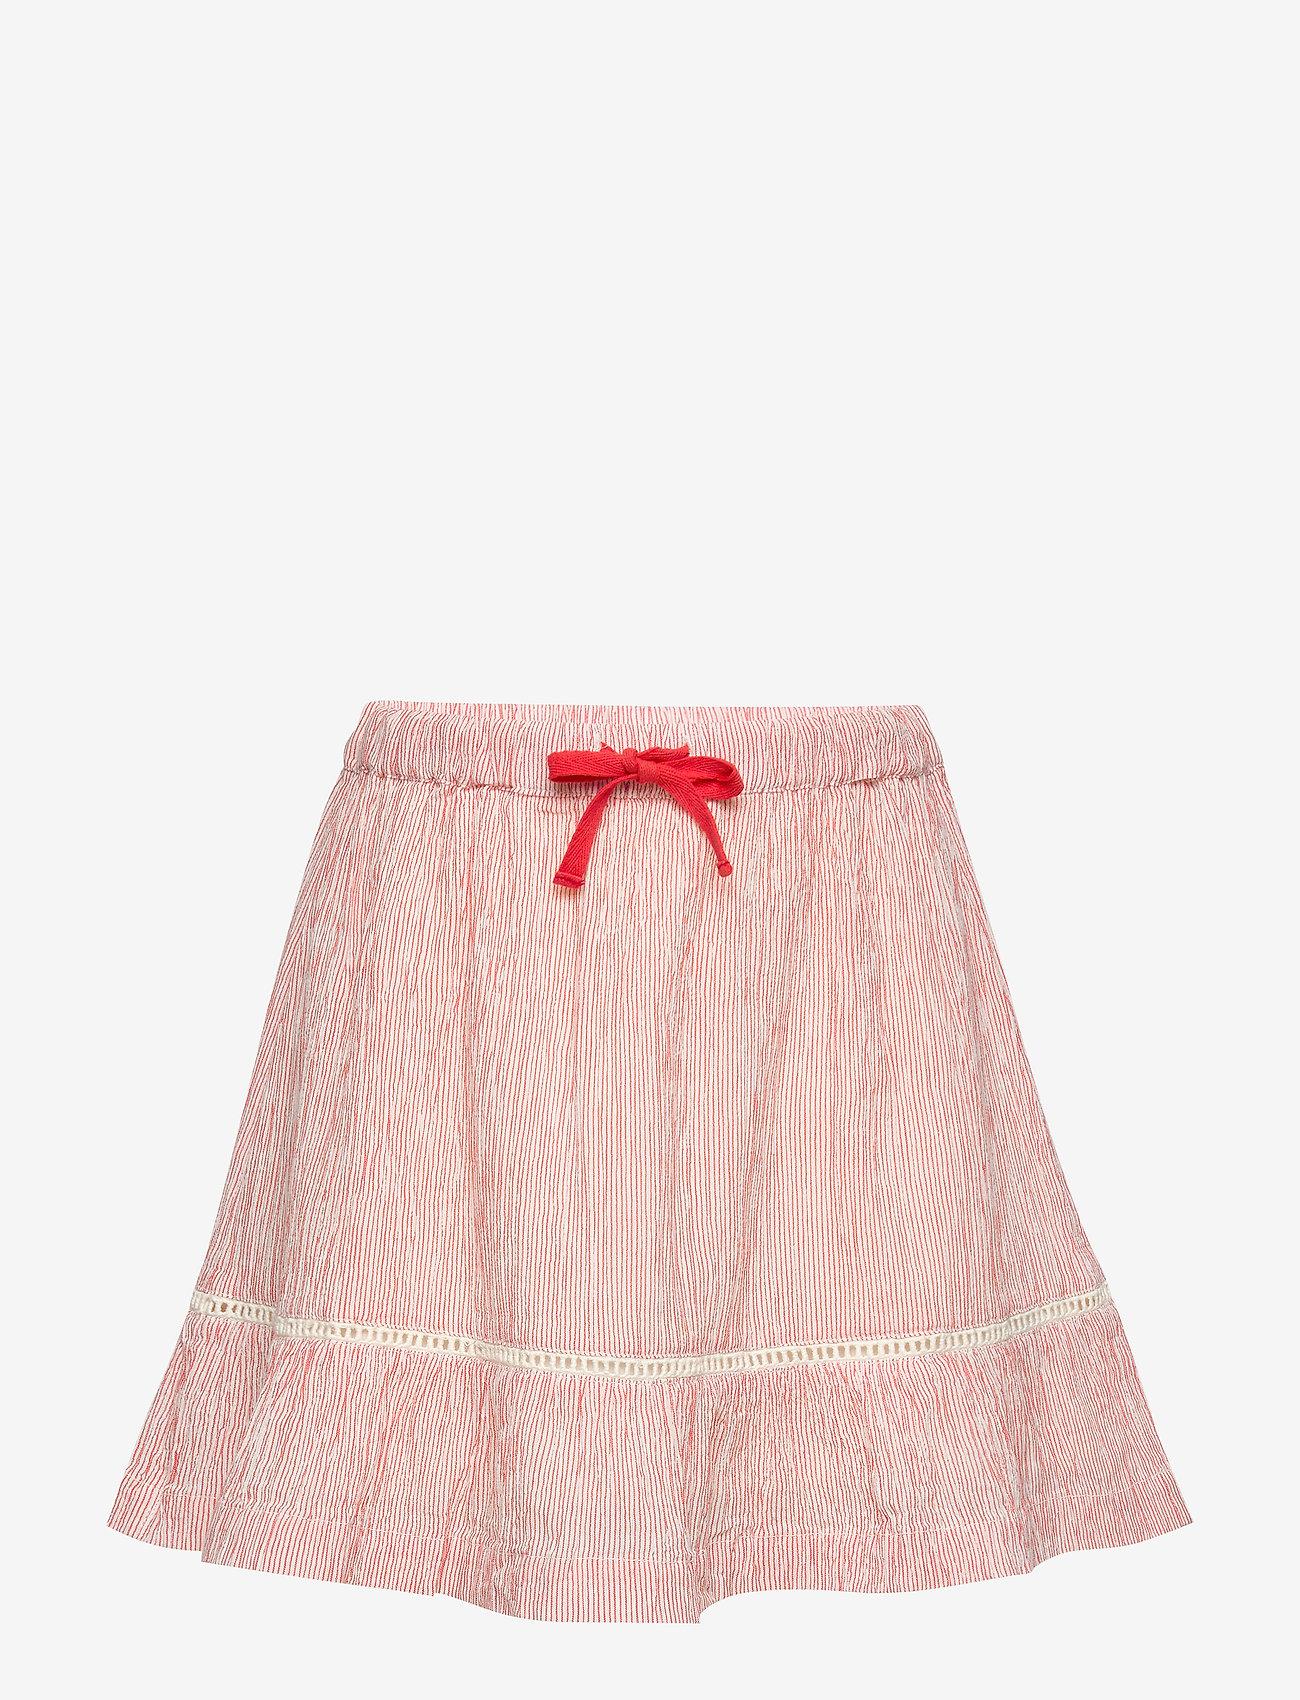 Noa Noa Miniature - Skirt - skirts - paprika - 0